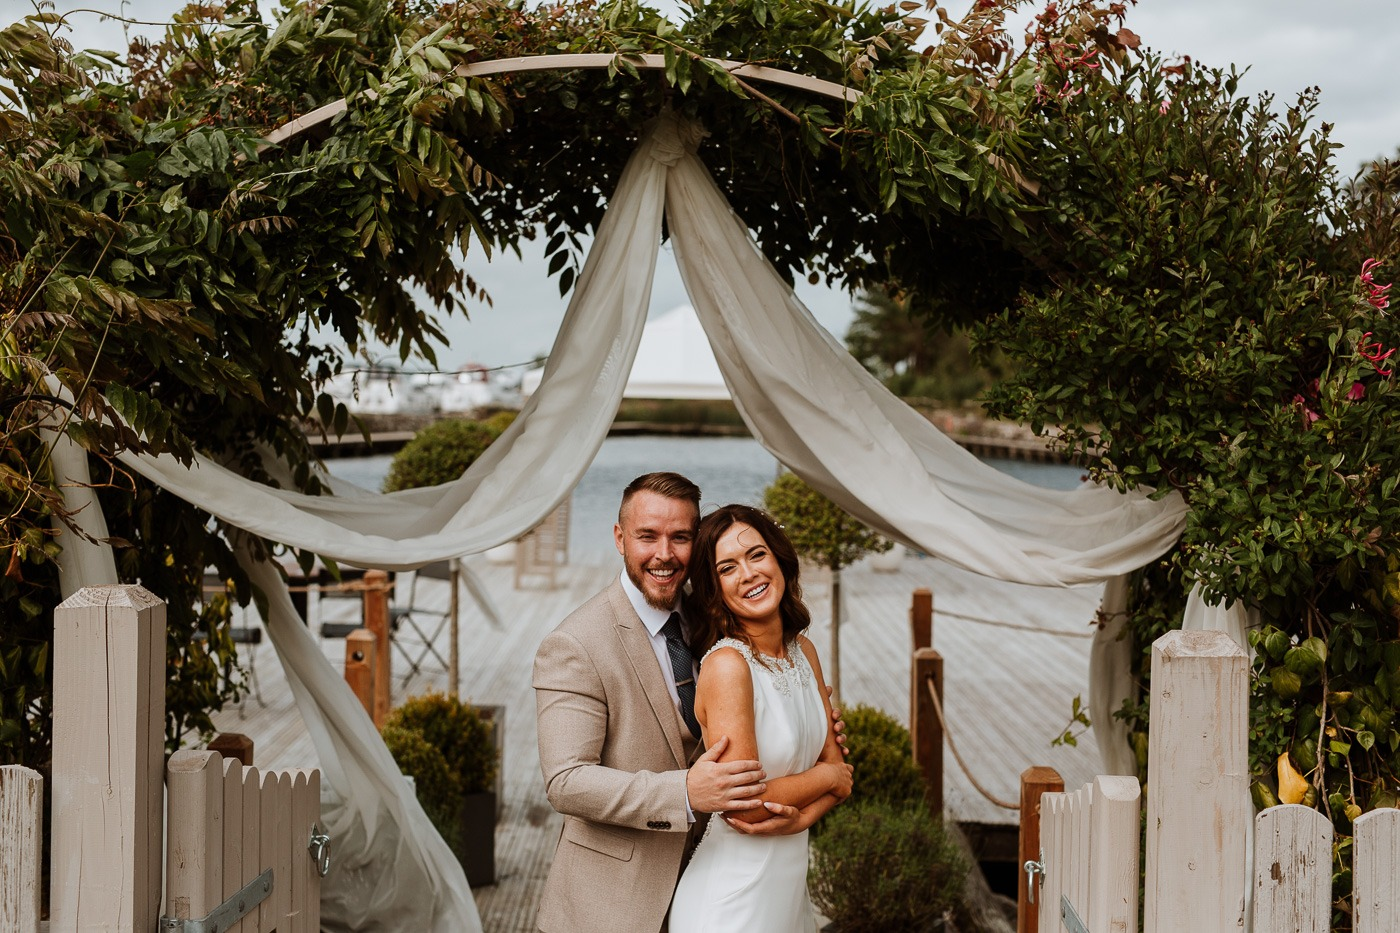 Sneak Peek of Sarah & Shane's Wedding at Coolbawn Quay